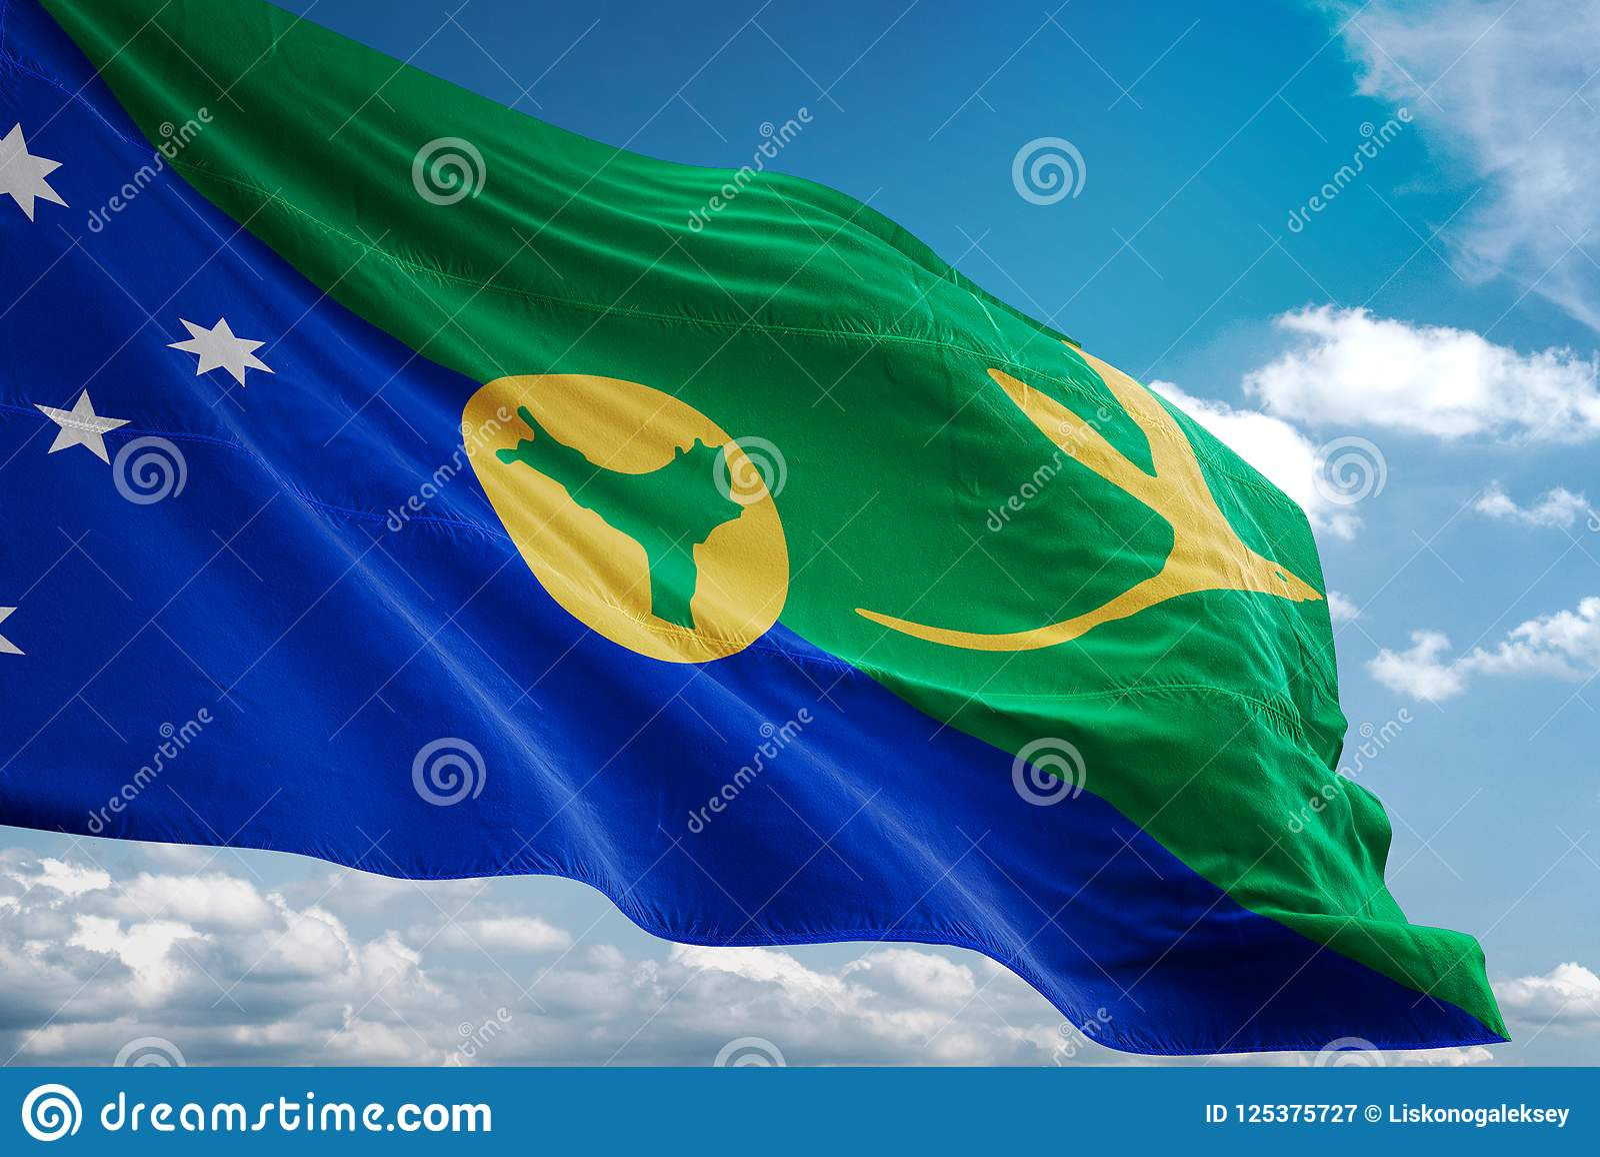 Christmas Island National Flag Waving Blue Sky Background Realistic 3d Illustration Stock ...